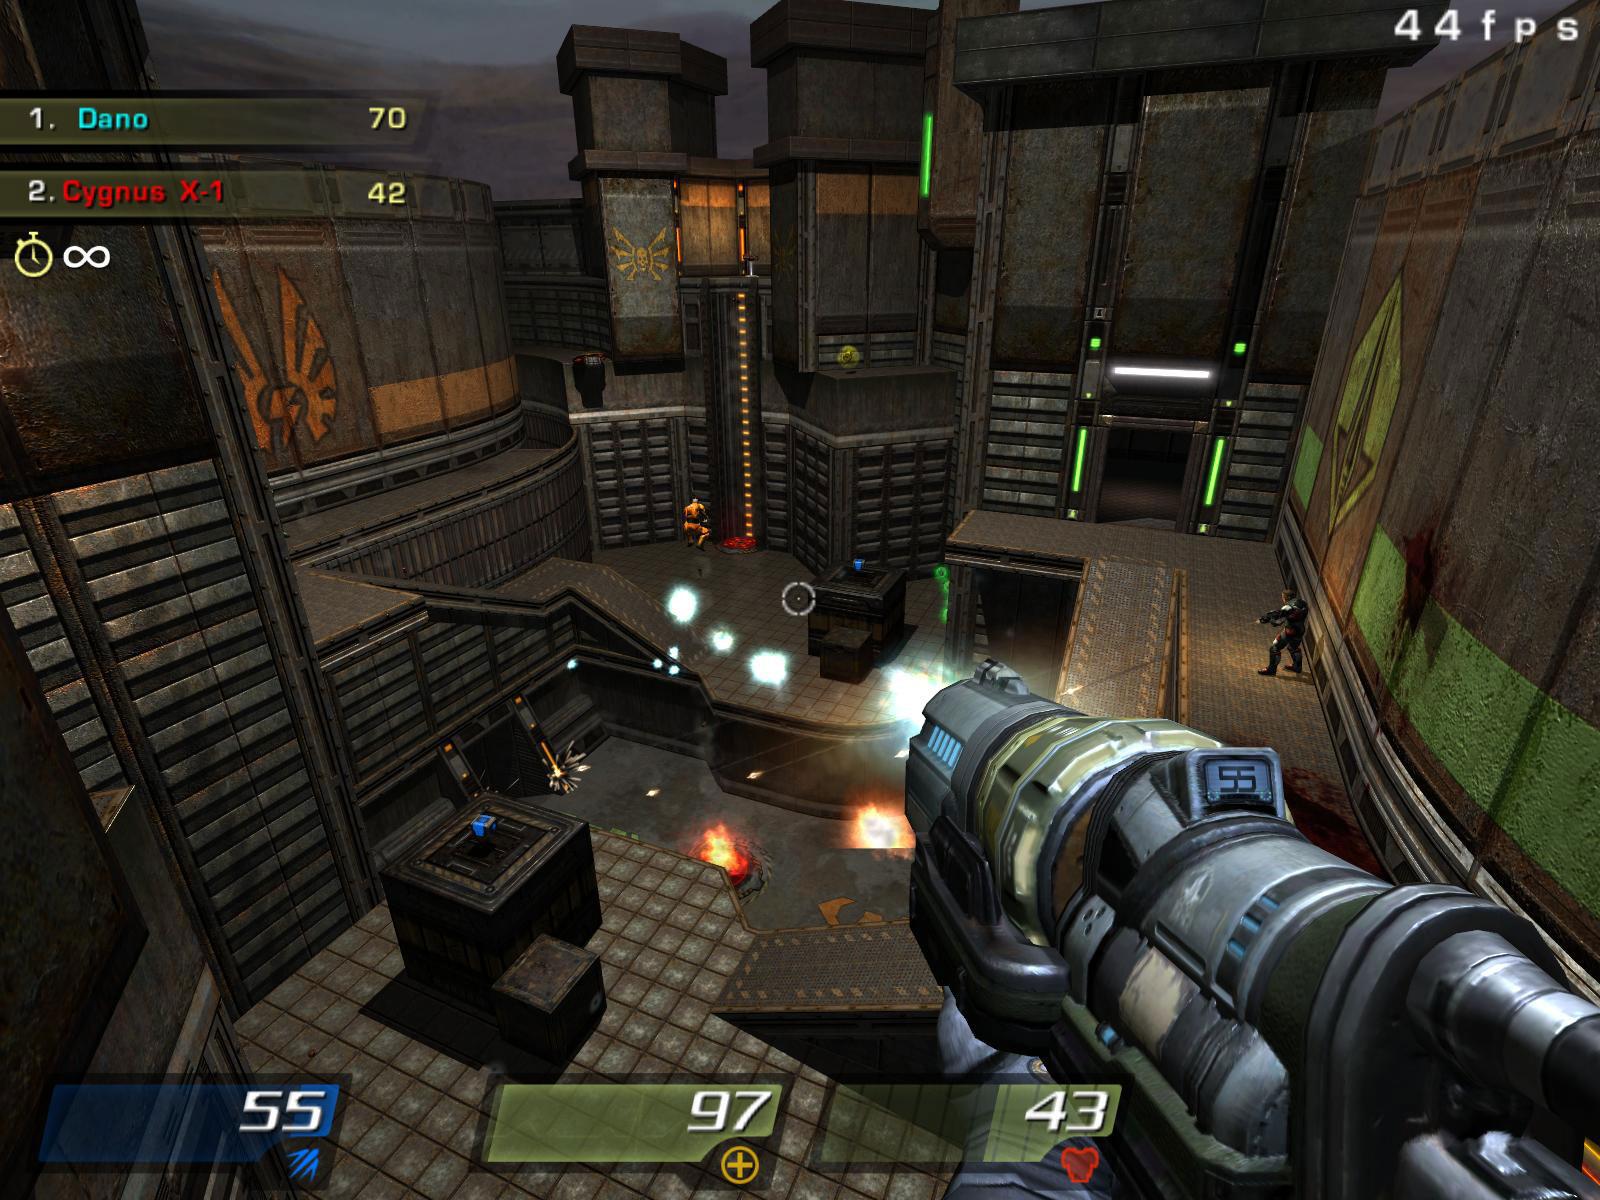 Alien Shooter Ii Pc Game Full Version Free Download